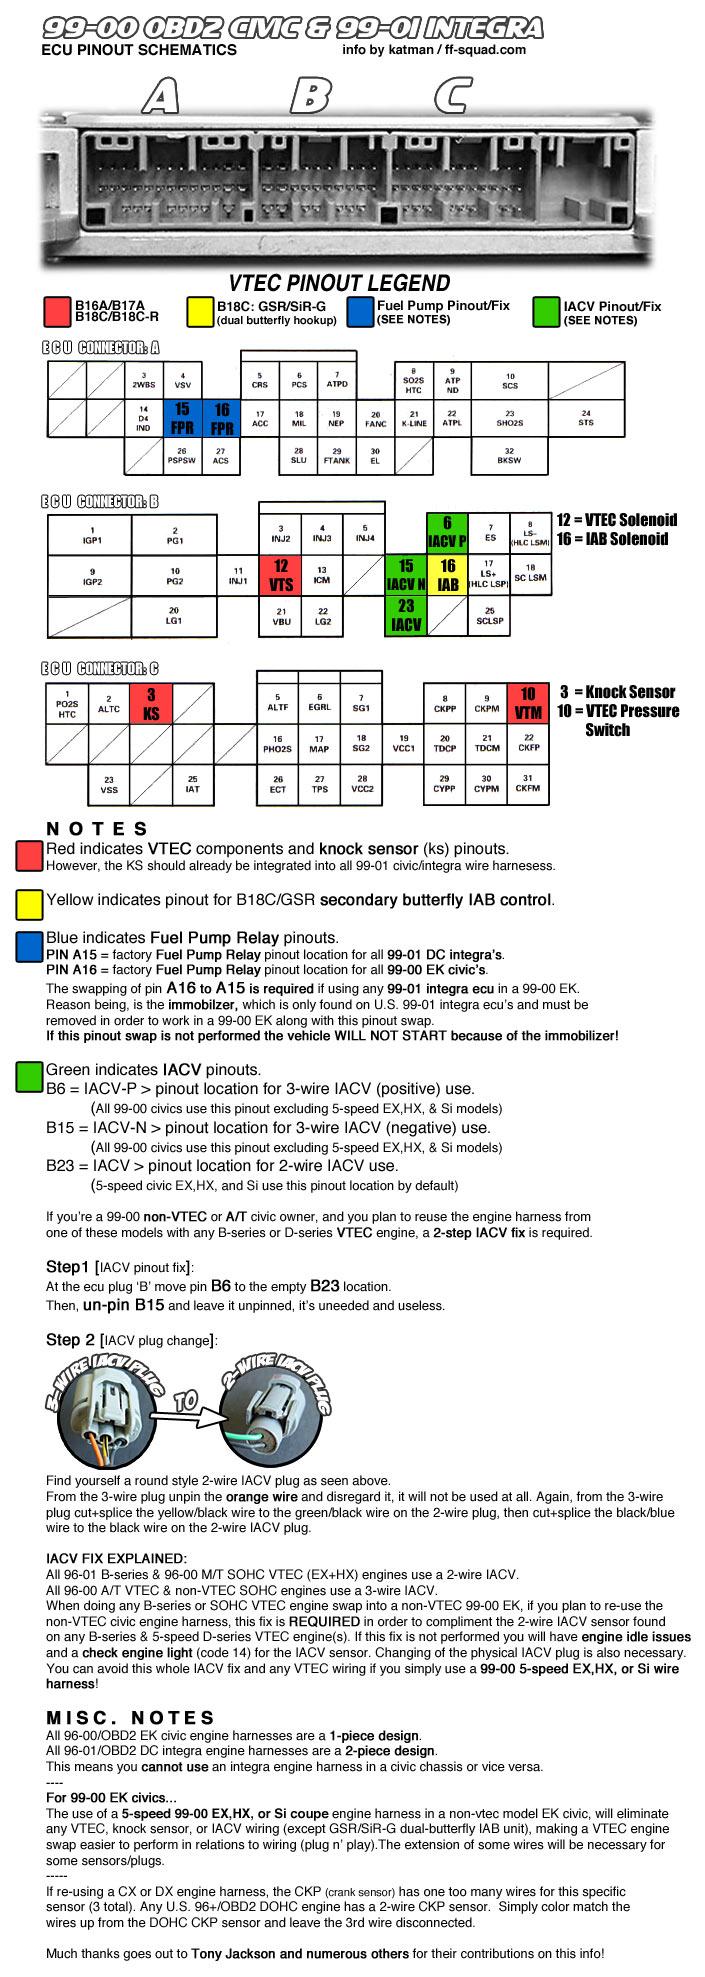 obd0 to obd1 vtec wiring diagram 2007 kia rio radio engine tuning solutions | tech area - phearable.net